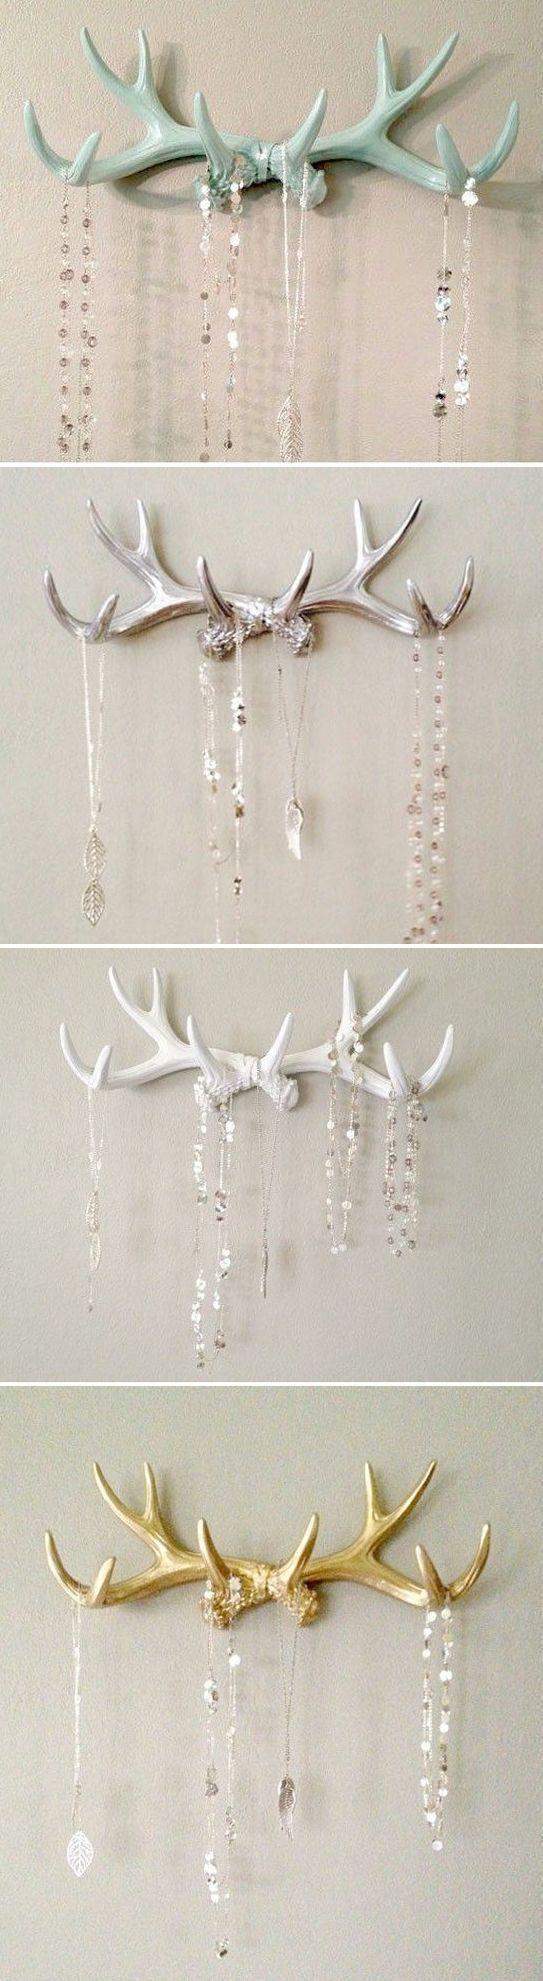 The 25 best deer antler crafts ideas on pinterest deer for Fake deer antlers for crafts